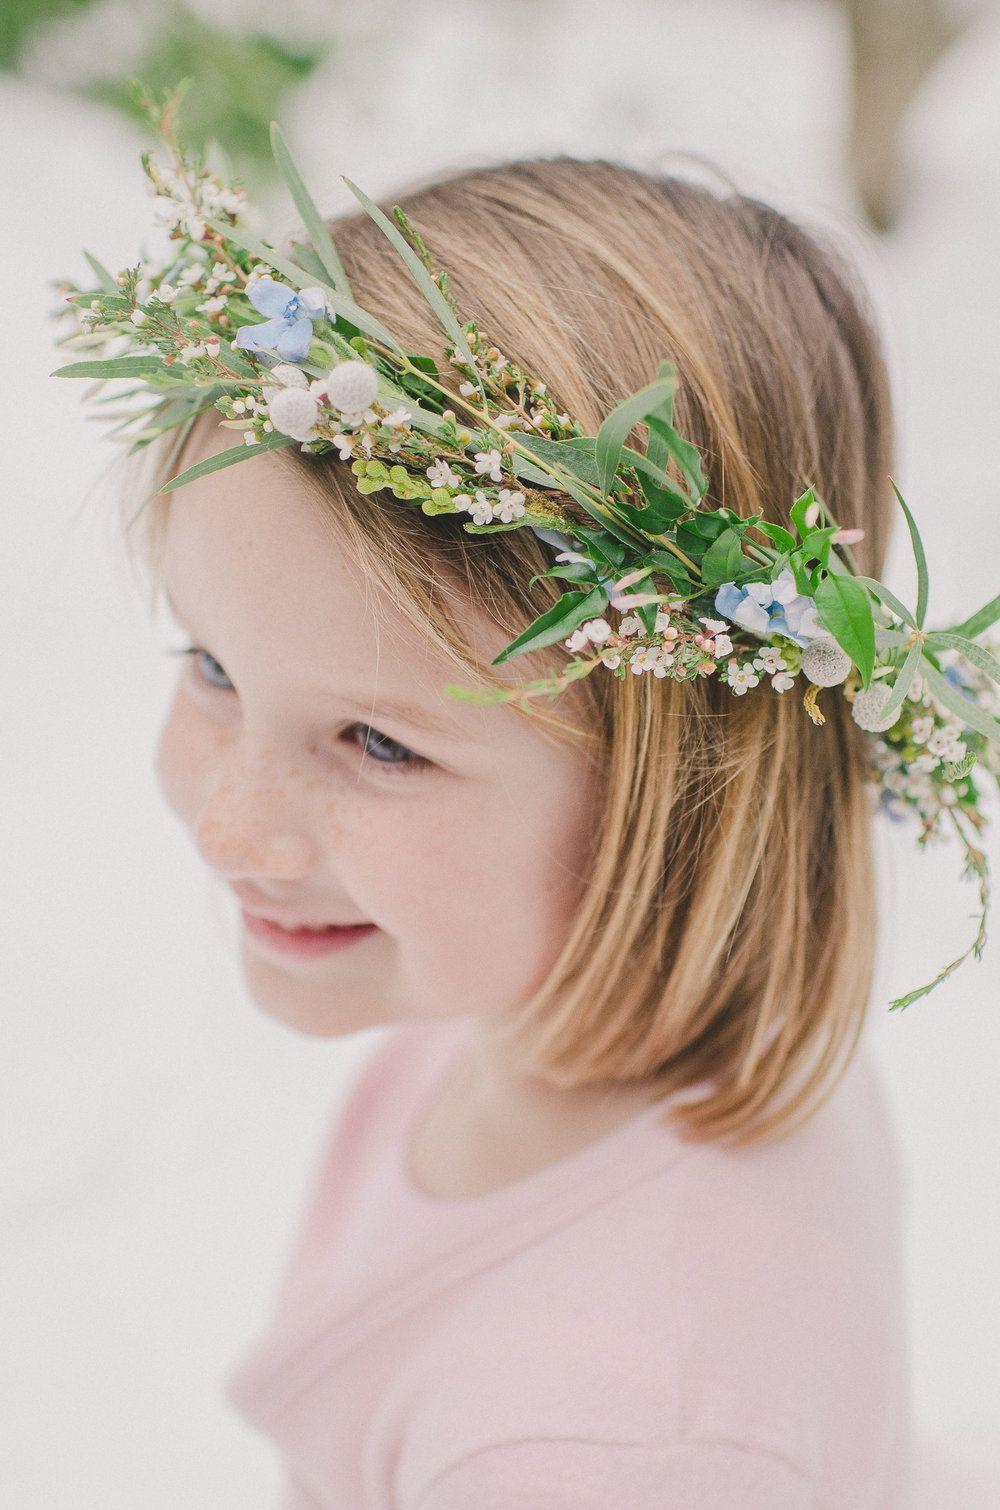 Wedding hair accessories gloucestershire - Explore Wedding Flower Girls Wedding Flowers And More